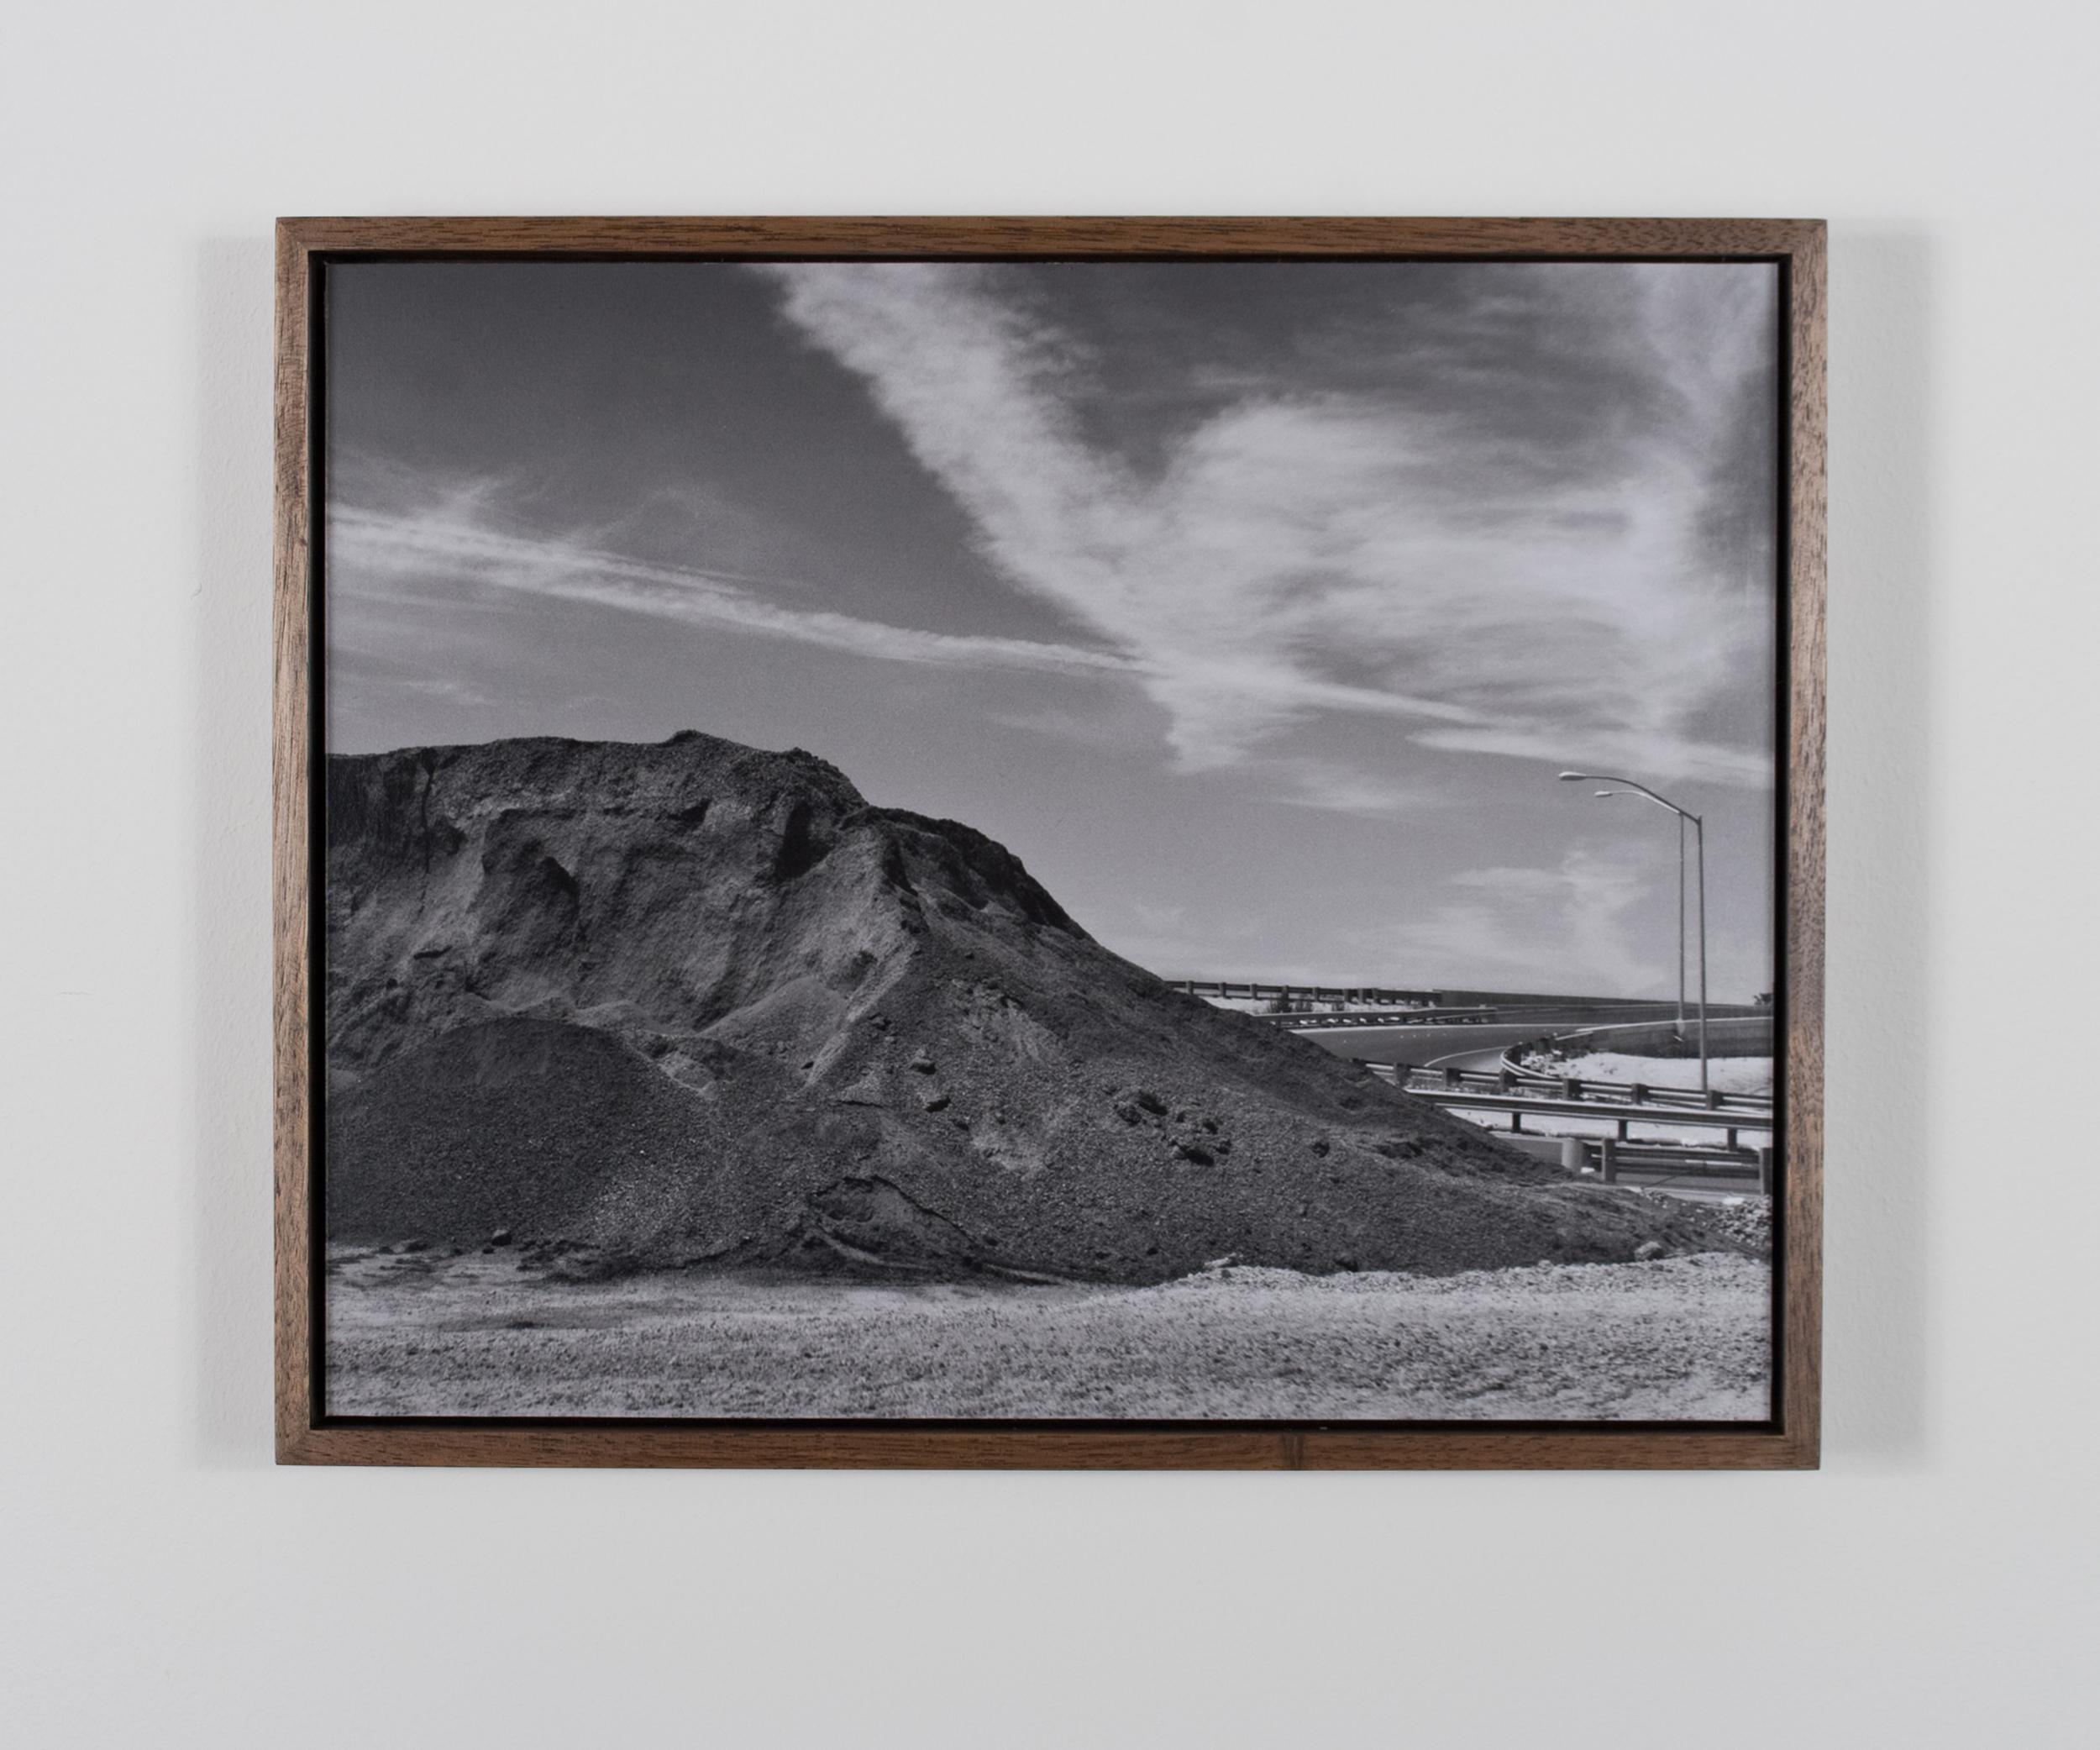 Mount Aorta 2009/10 Gelatin-silver print on Dibond, with walnut frame